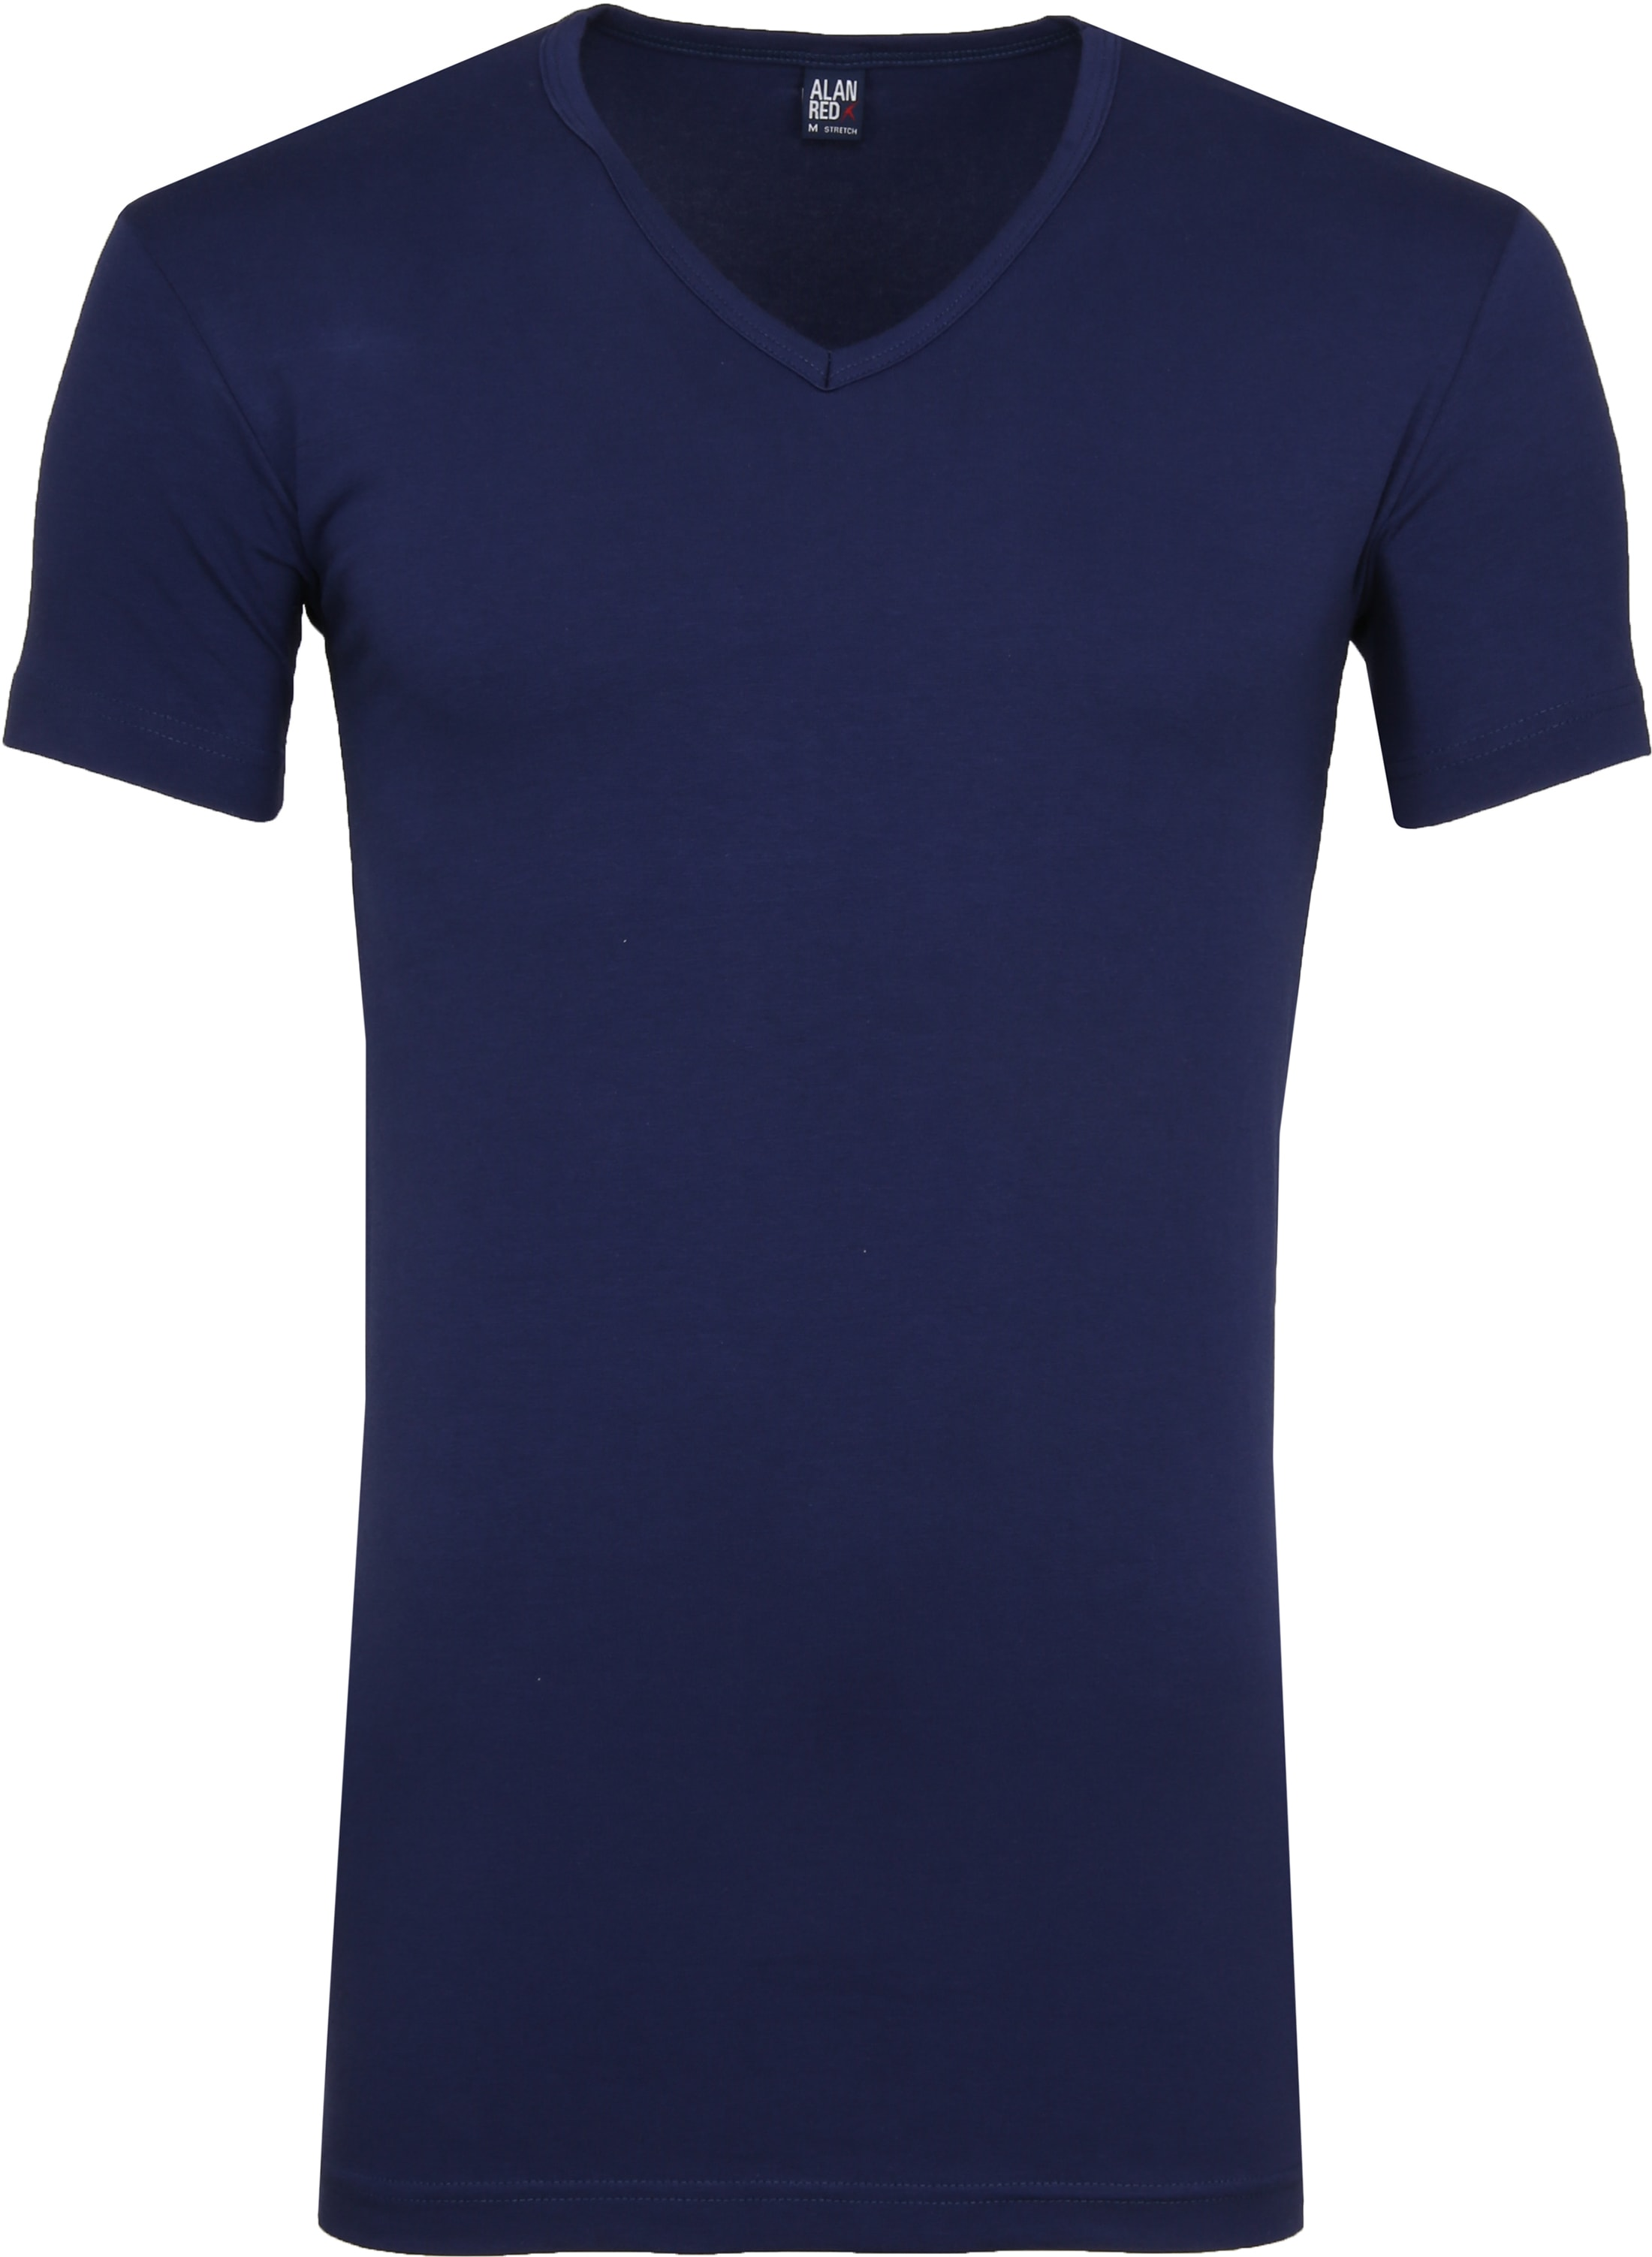 Alan Red Oklahoma V-Hals T-Shirt Blauw Stretch (2Pack) foto 1